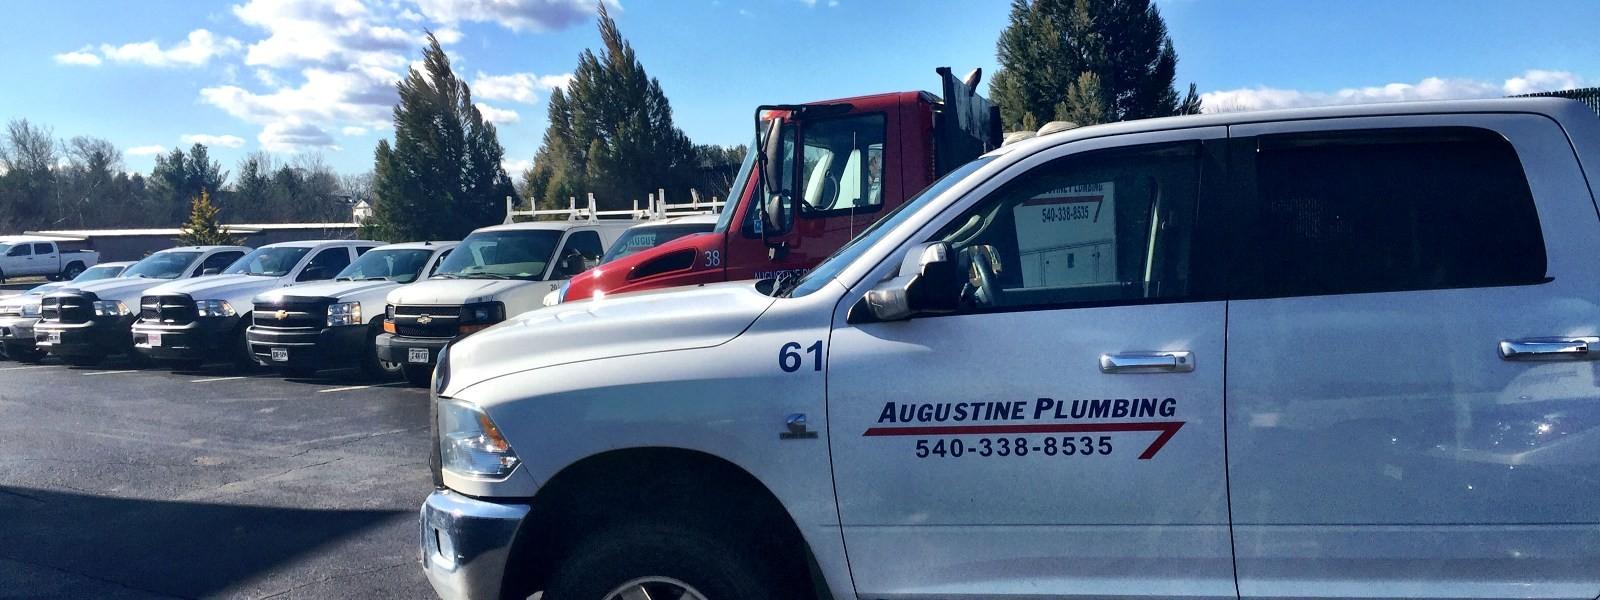 Augustine Plumbing